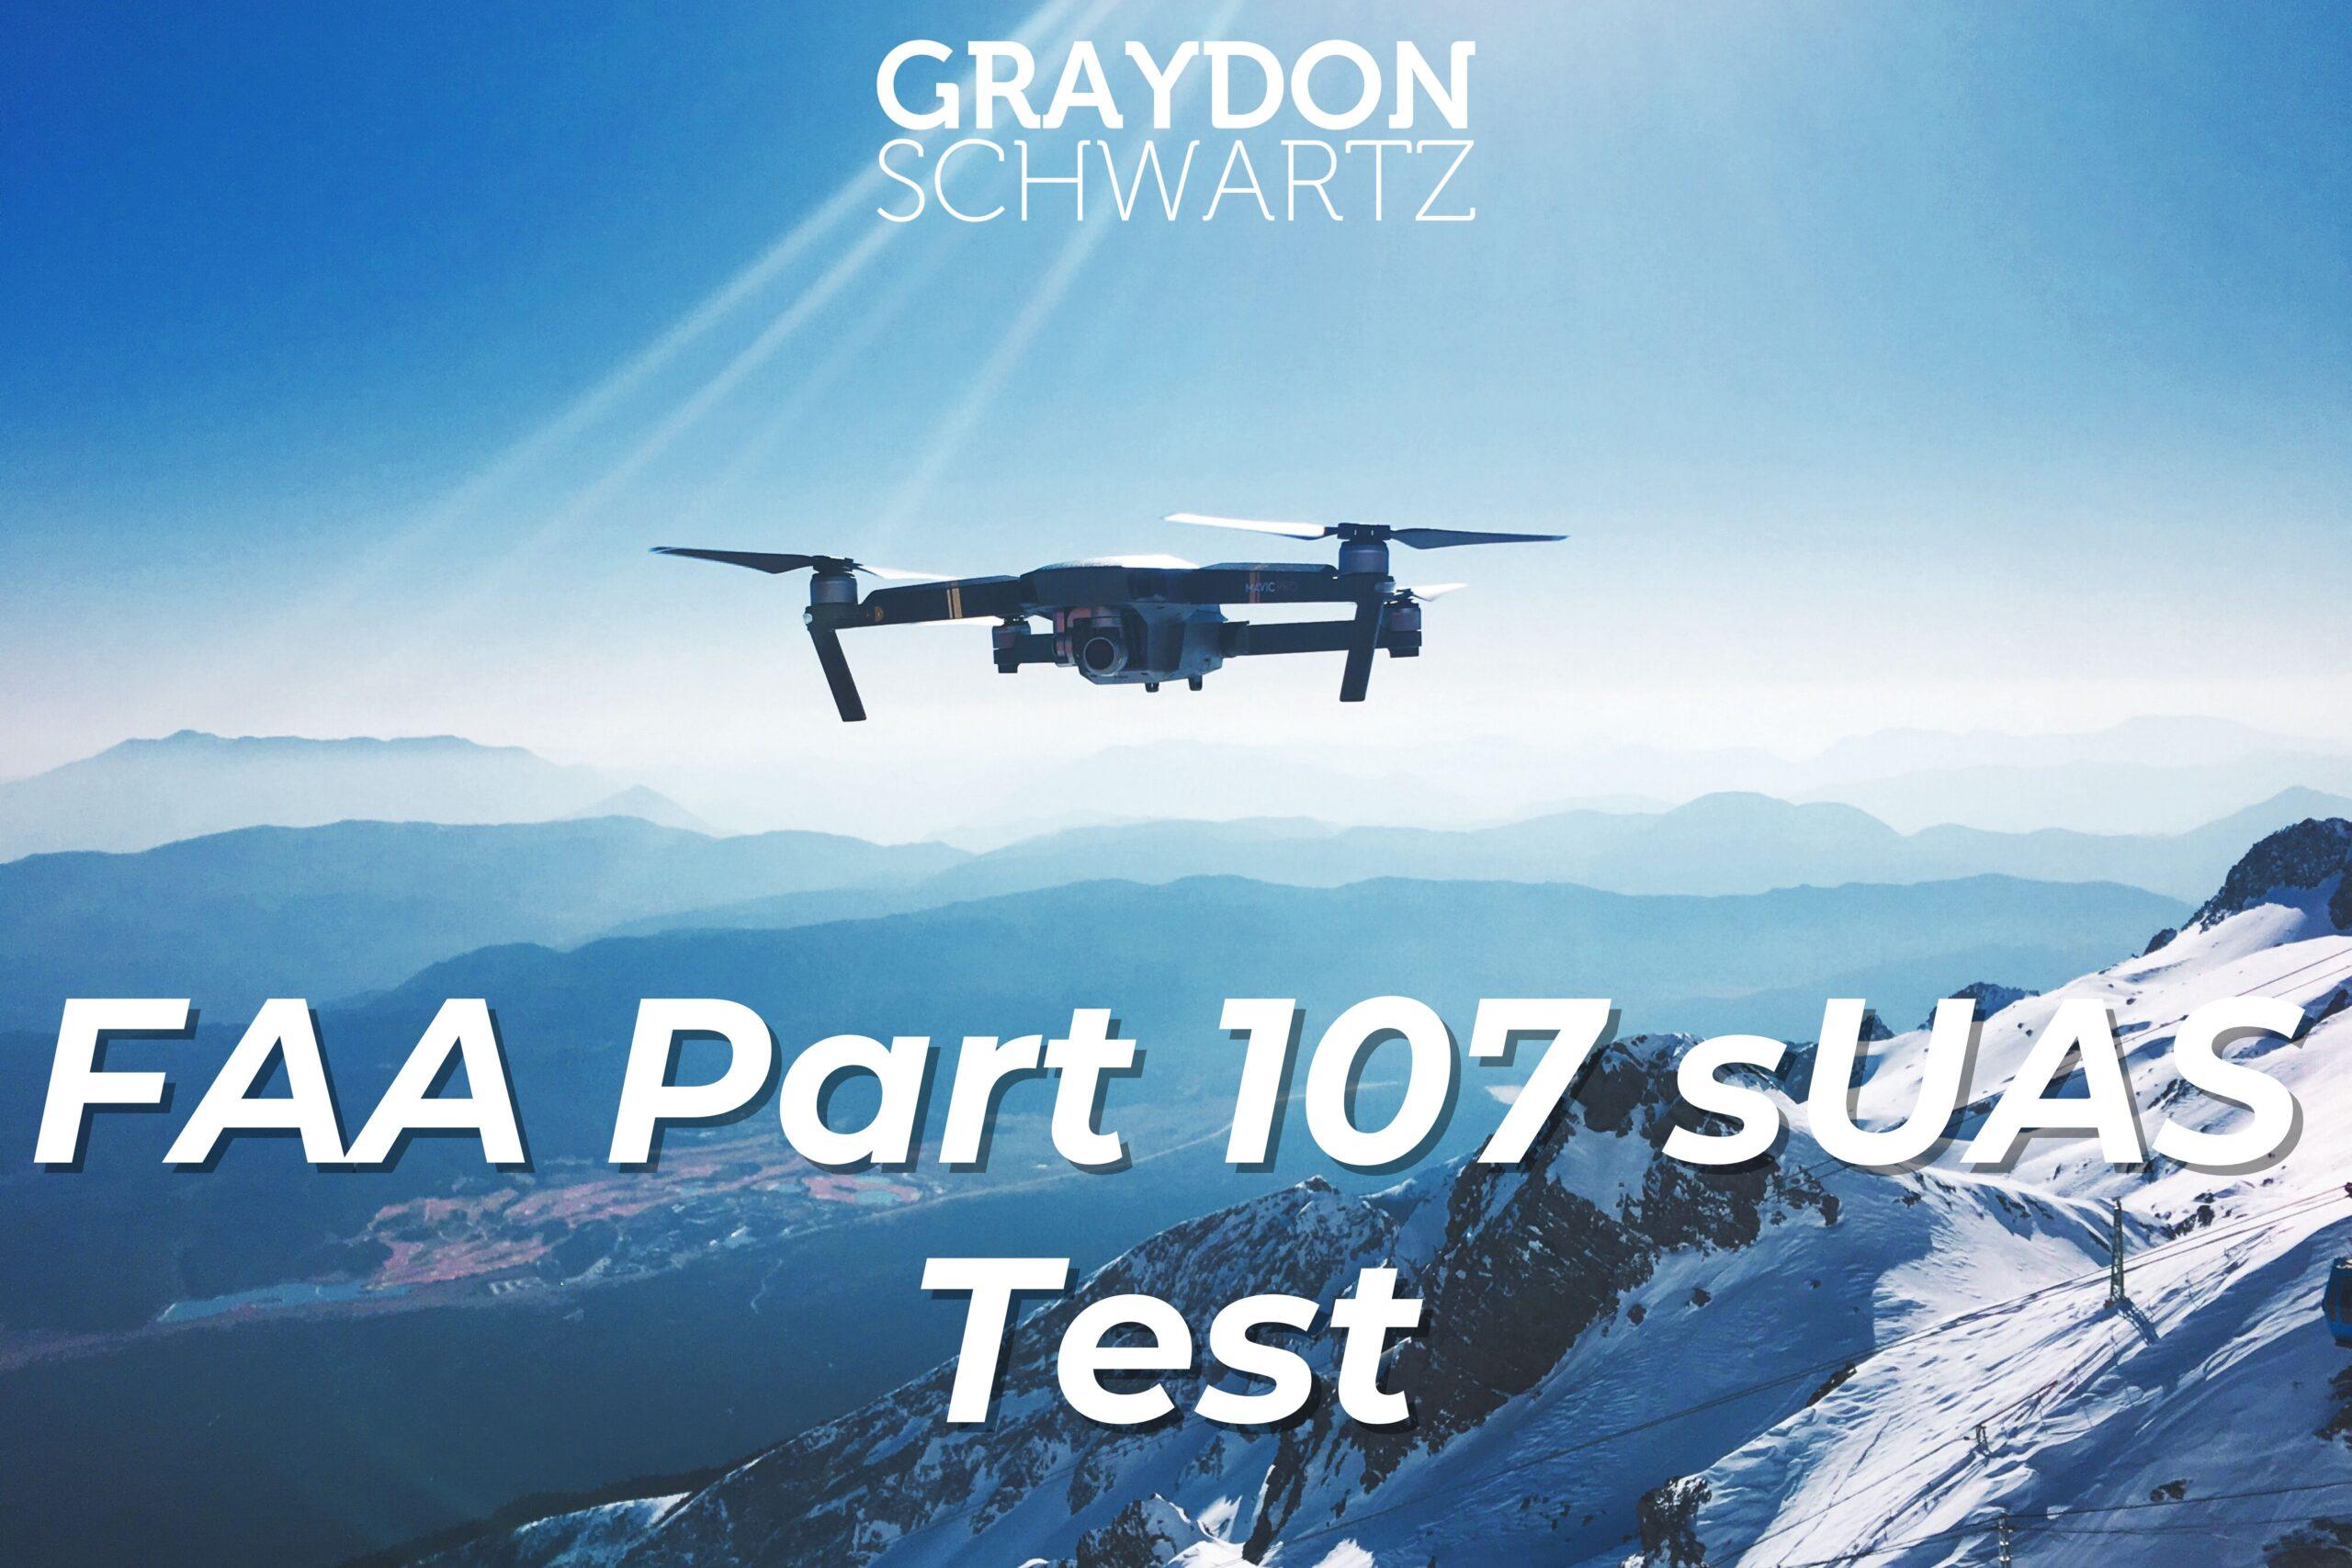 FAA Part 107 sUAS Test